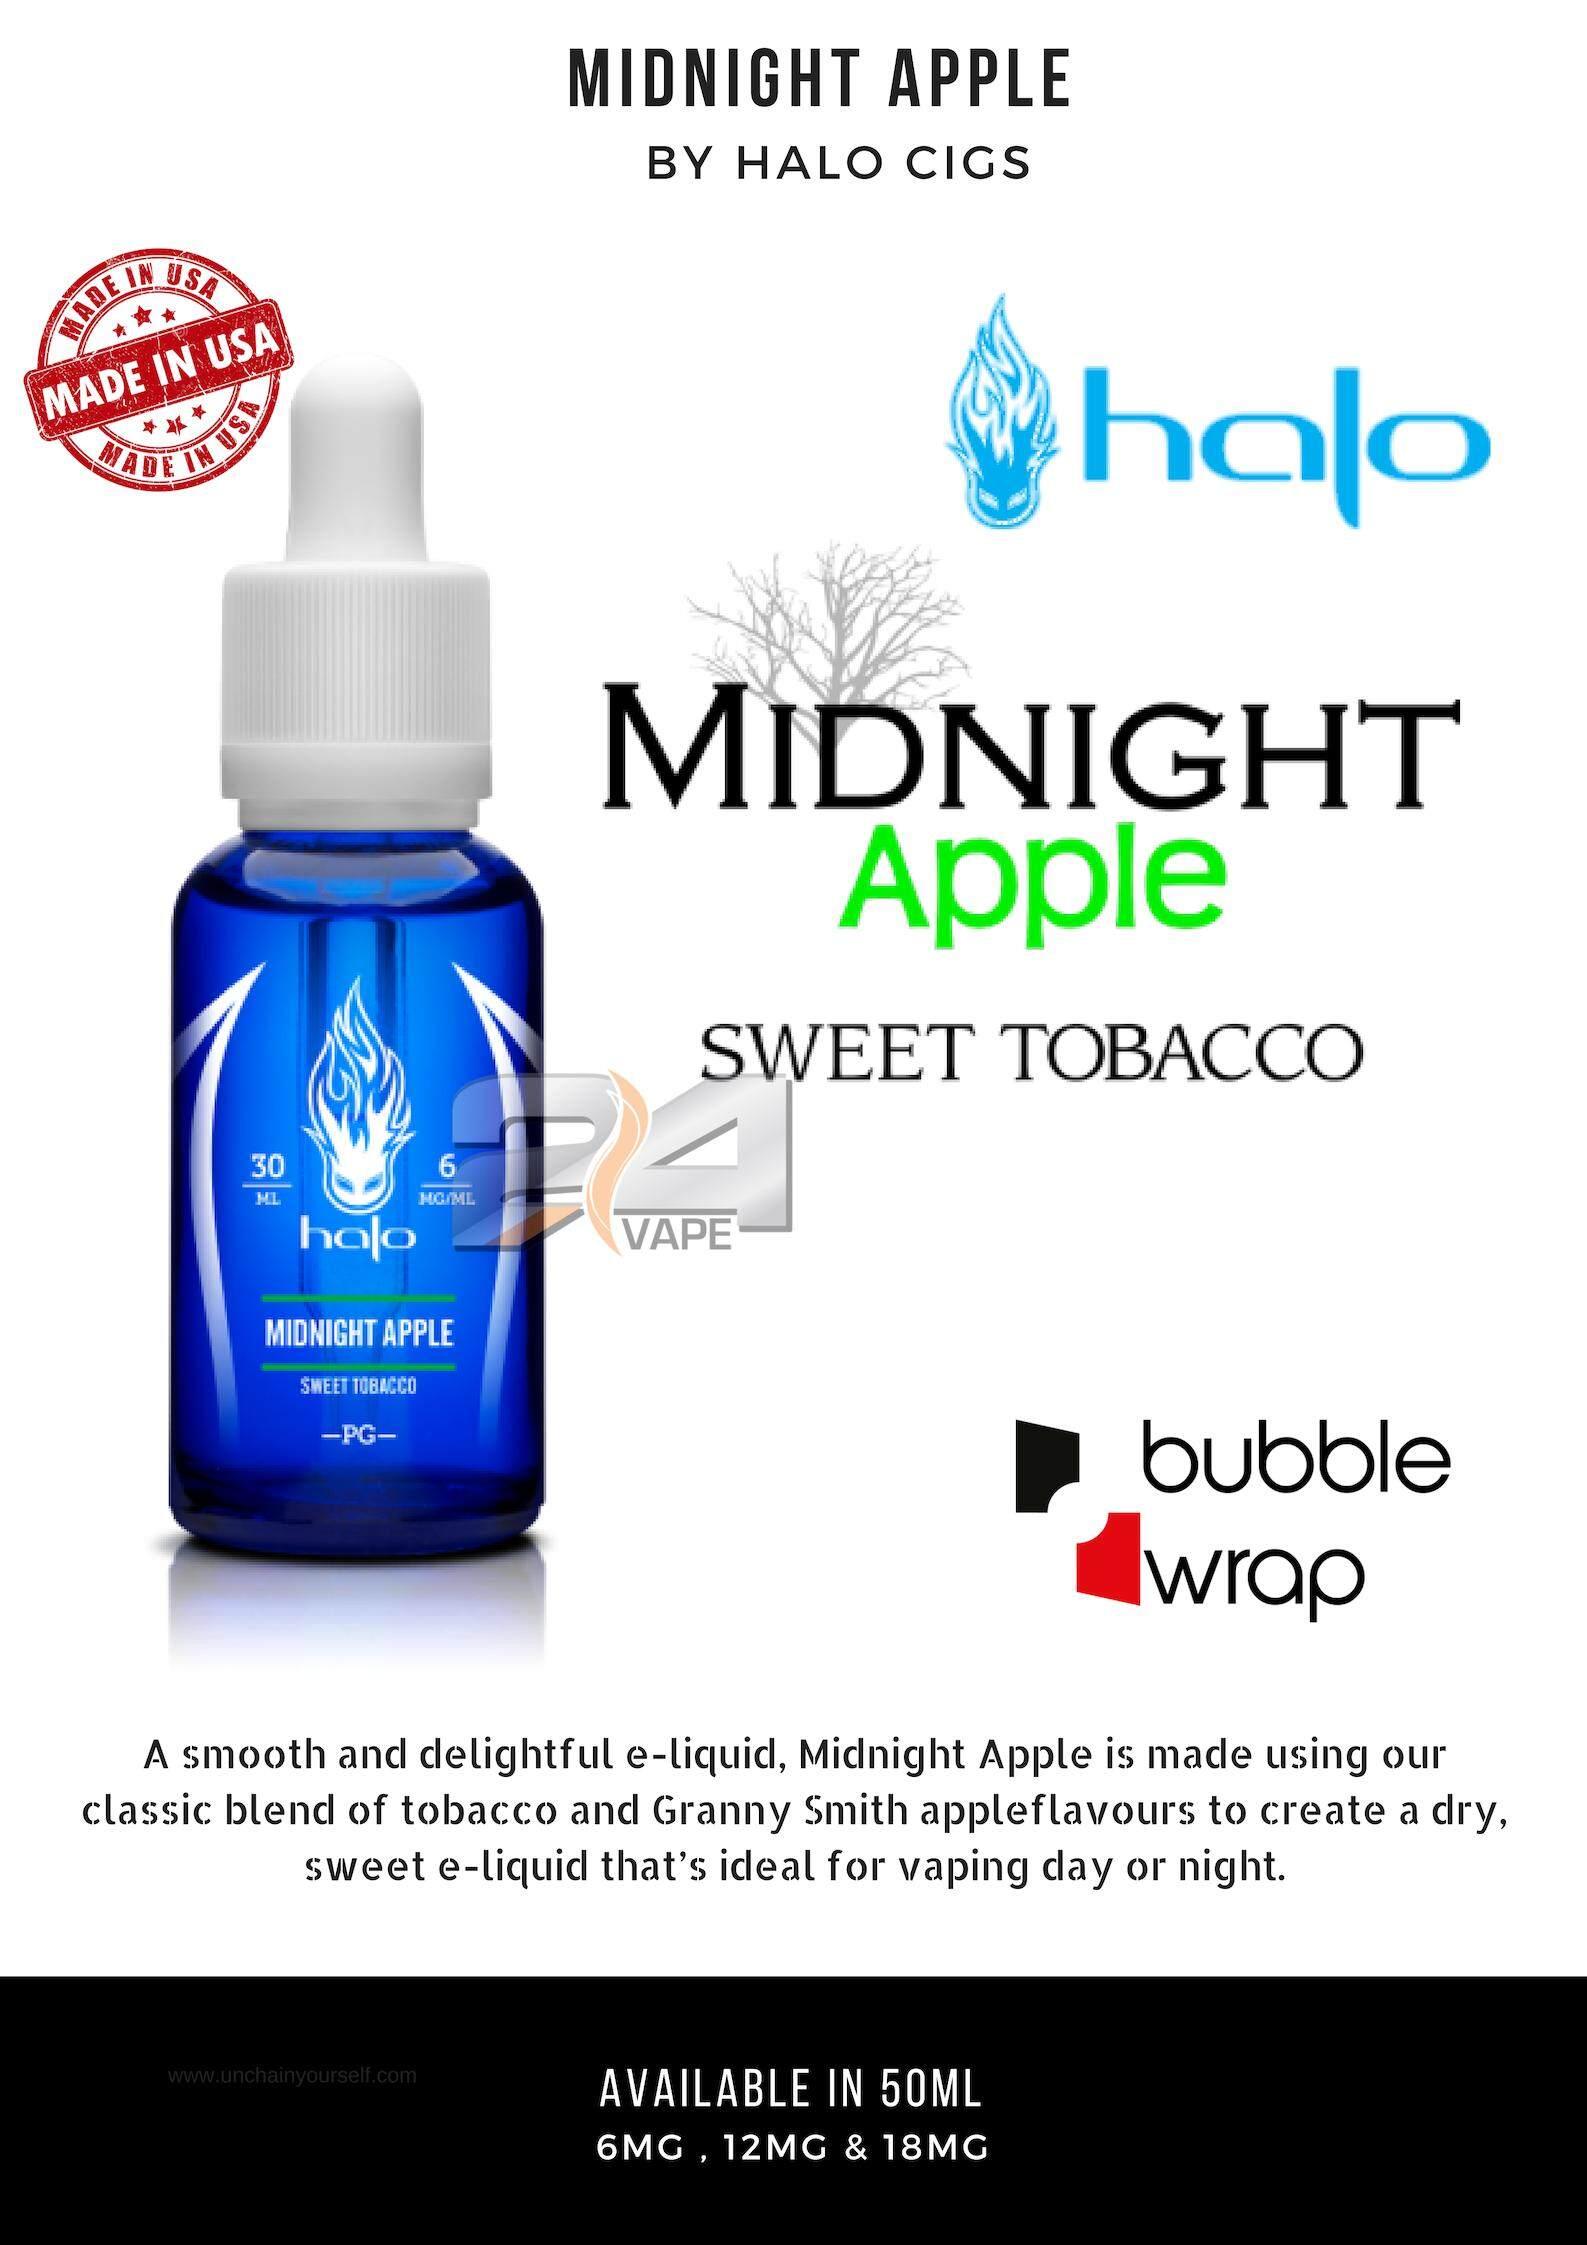 USA Made Halo Tobacco Midnight Apple E-liquid 50ML Authentic Blue Series